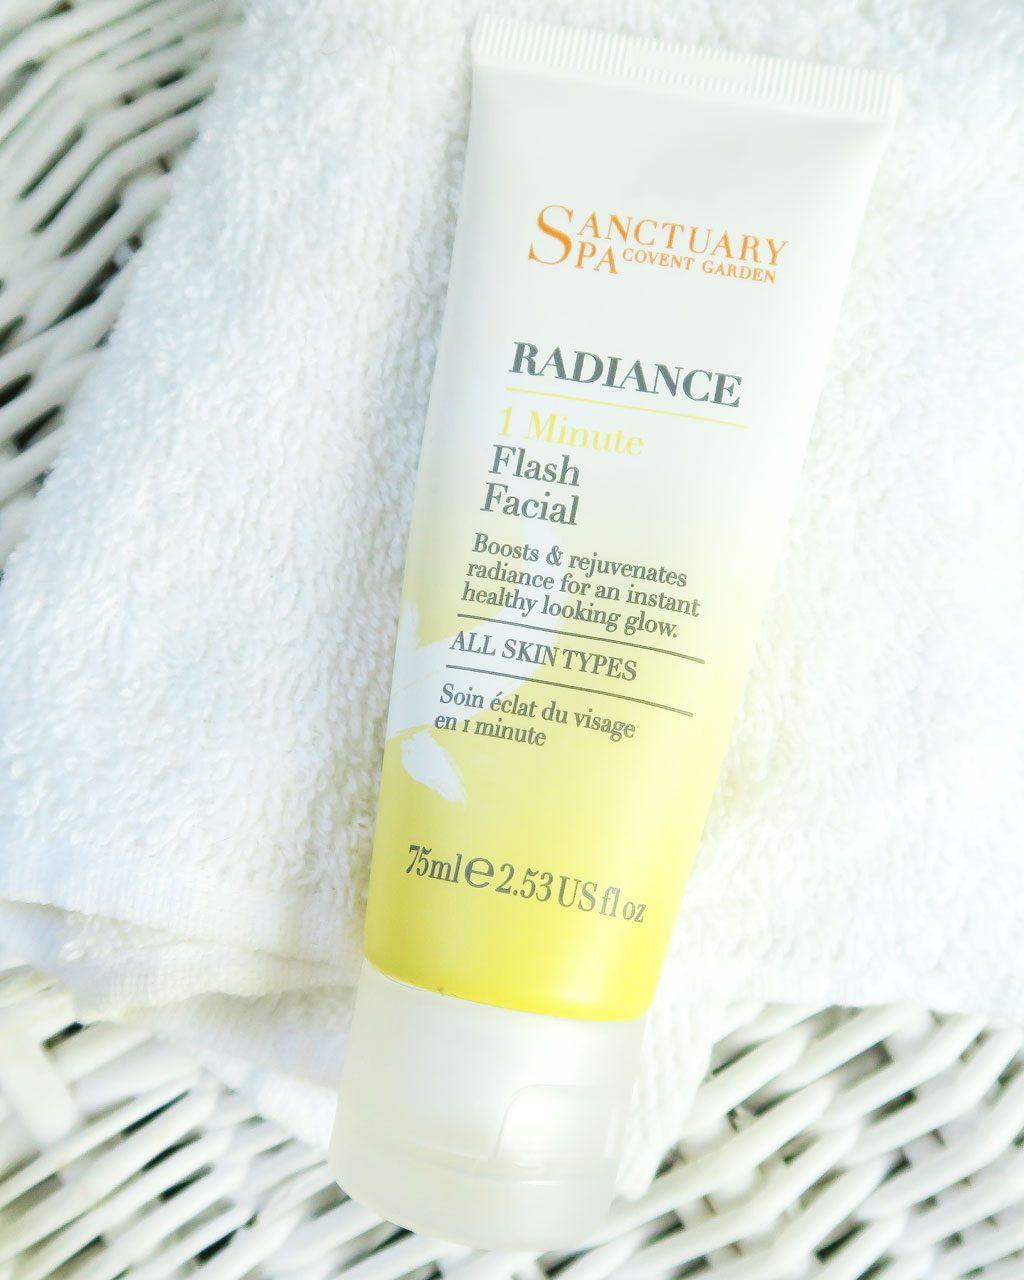 Sanctuary Spa Products Review — Sanctuary Spa 1 Minute Flash Facial